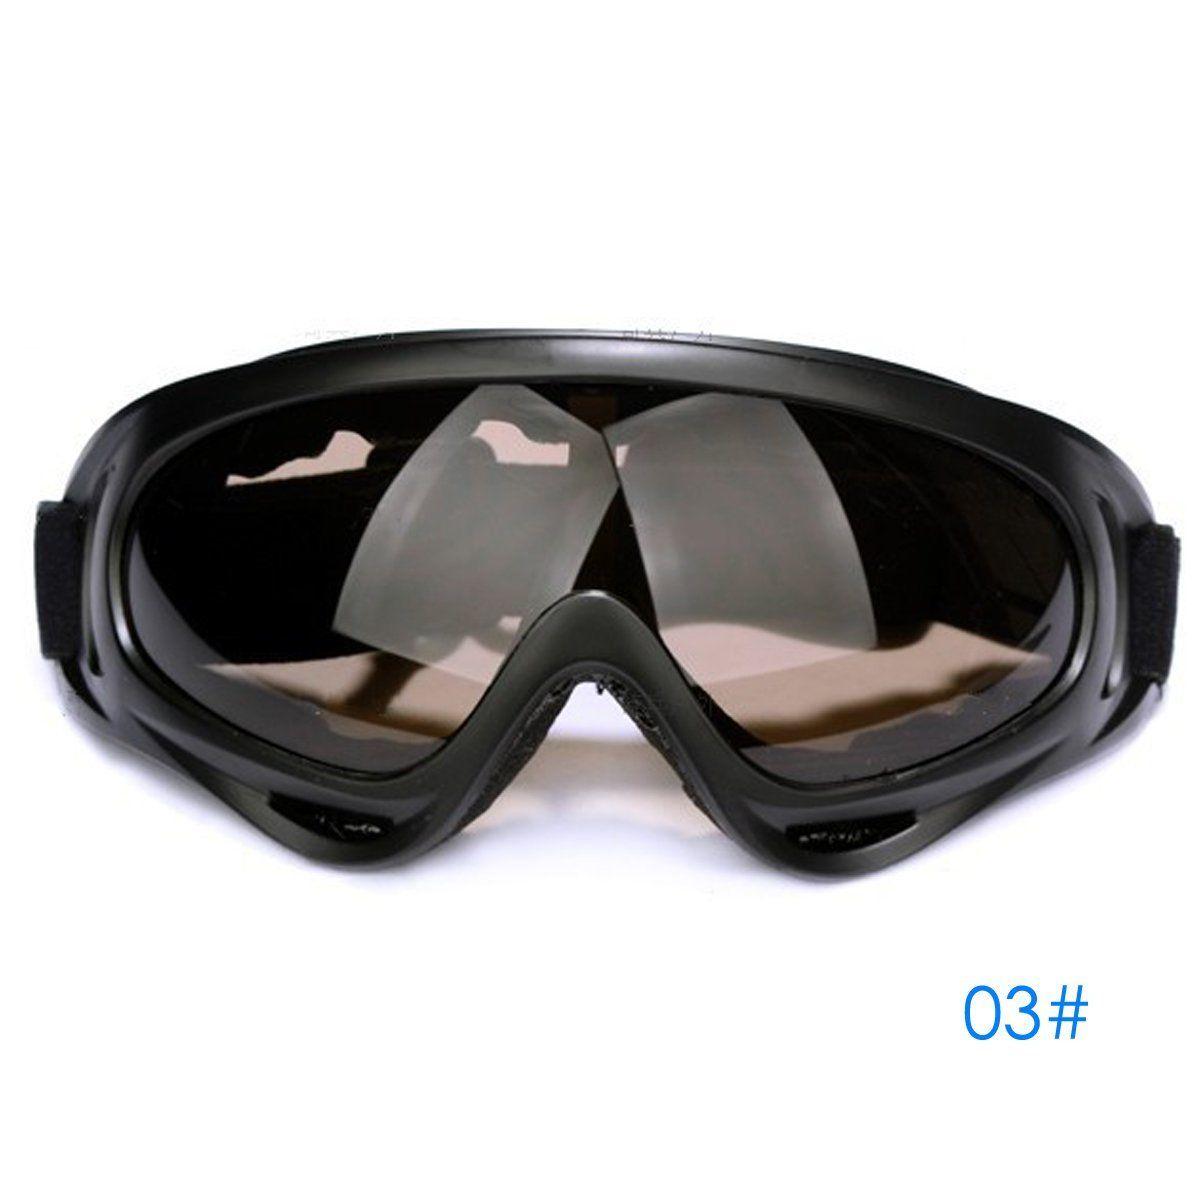 how to get glue off glasses lens